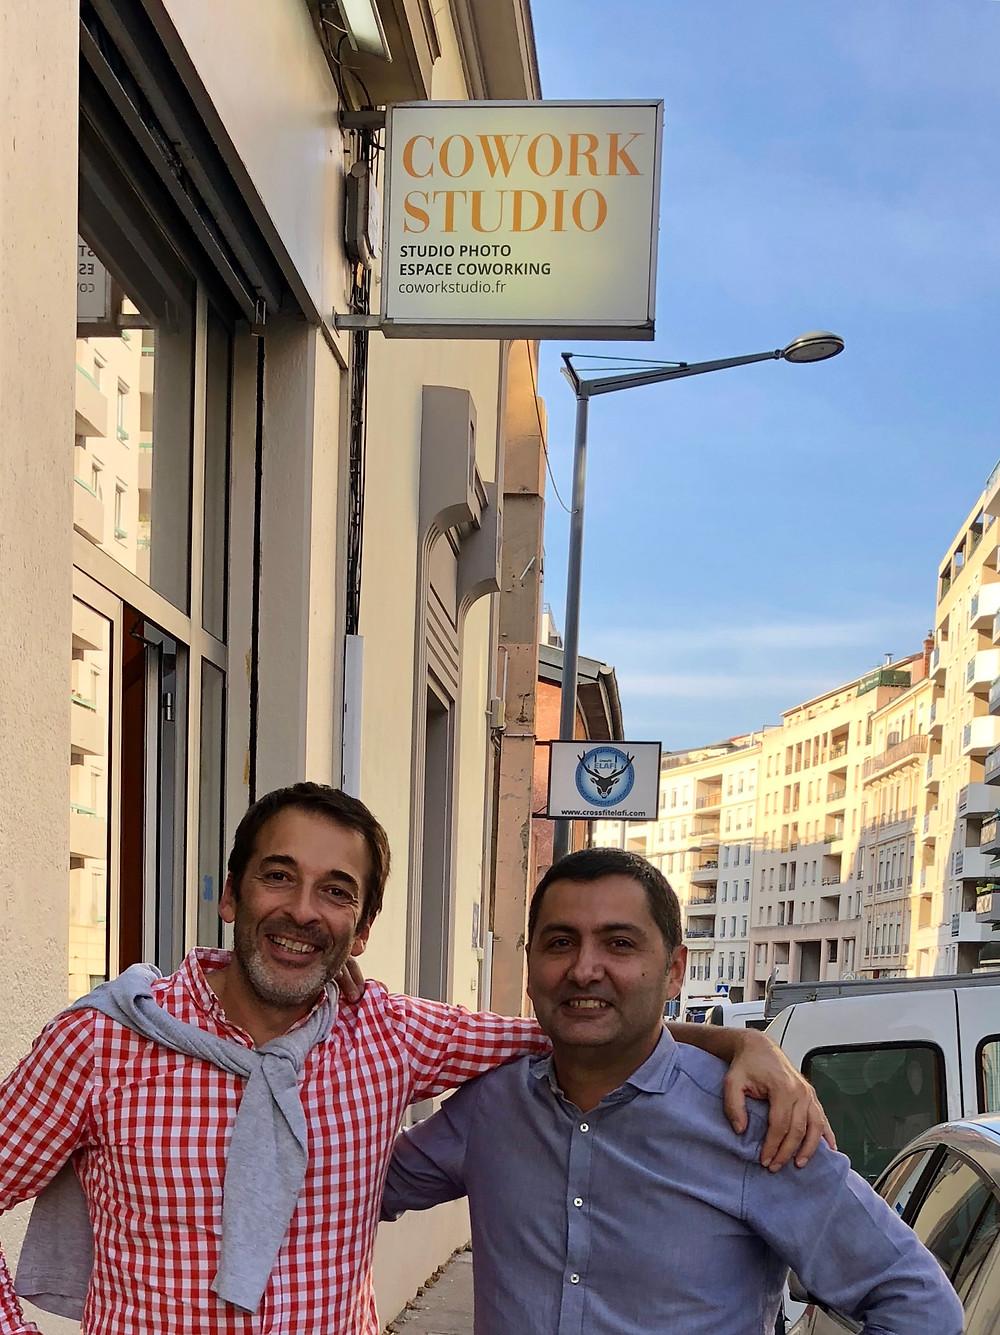 Arik & Sylvain coworkstudio founders